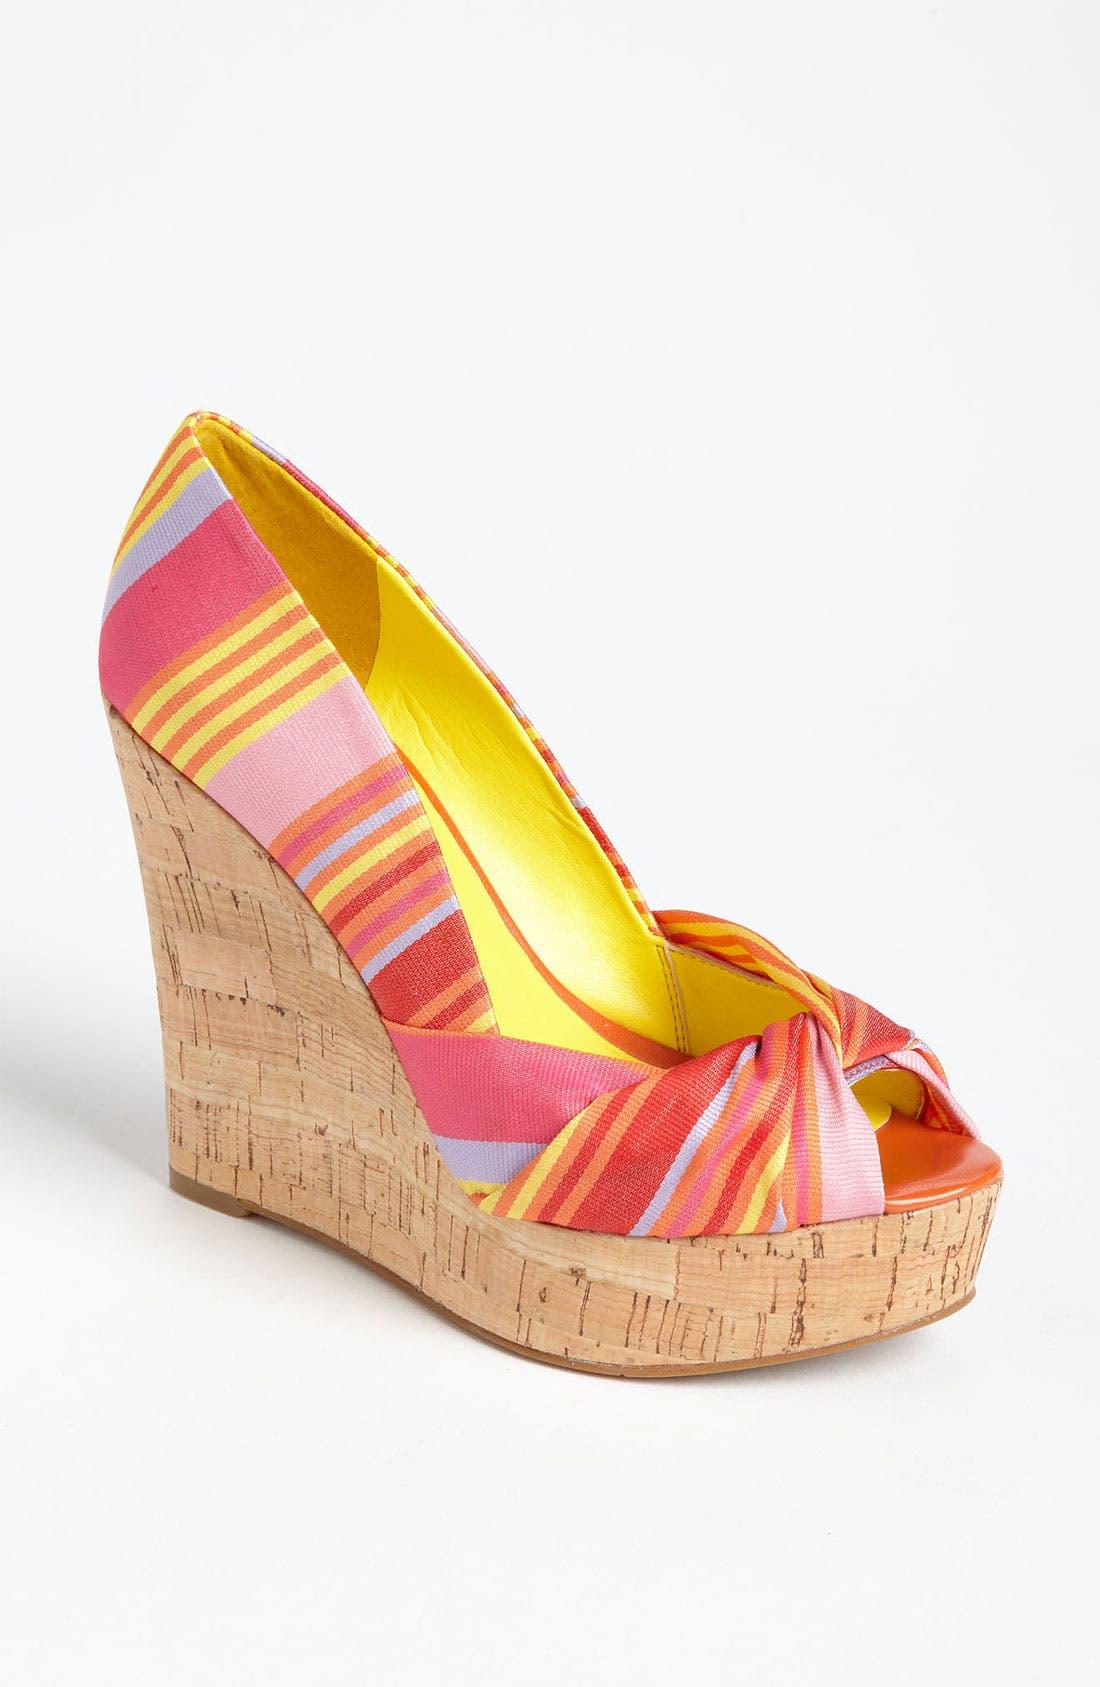 Main Image - Nine West 'Chillpill' Sandal